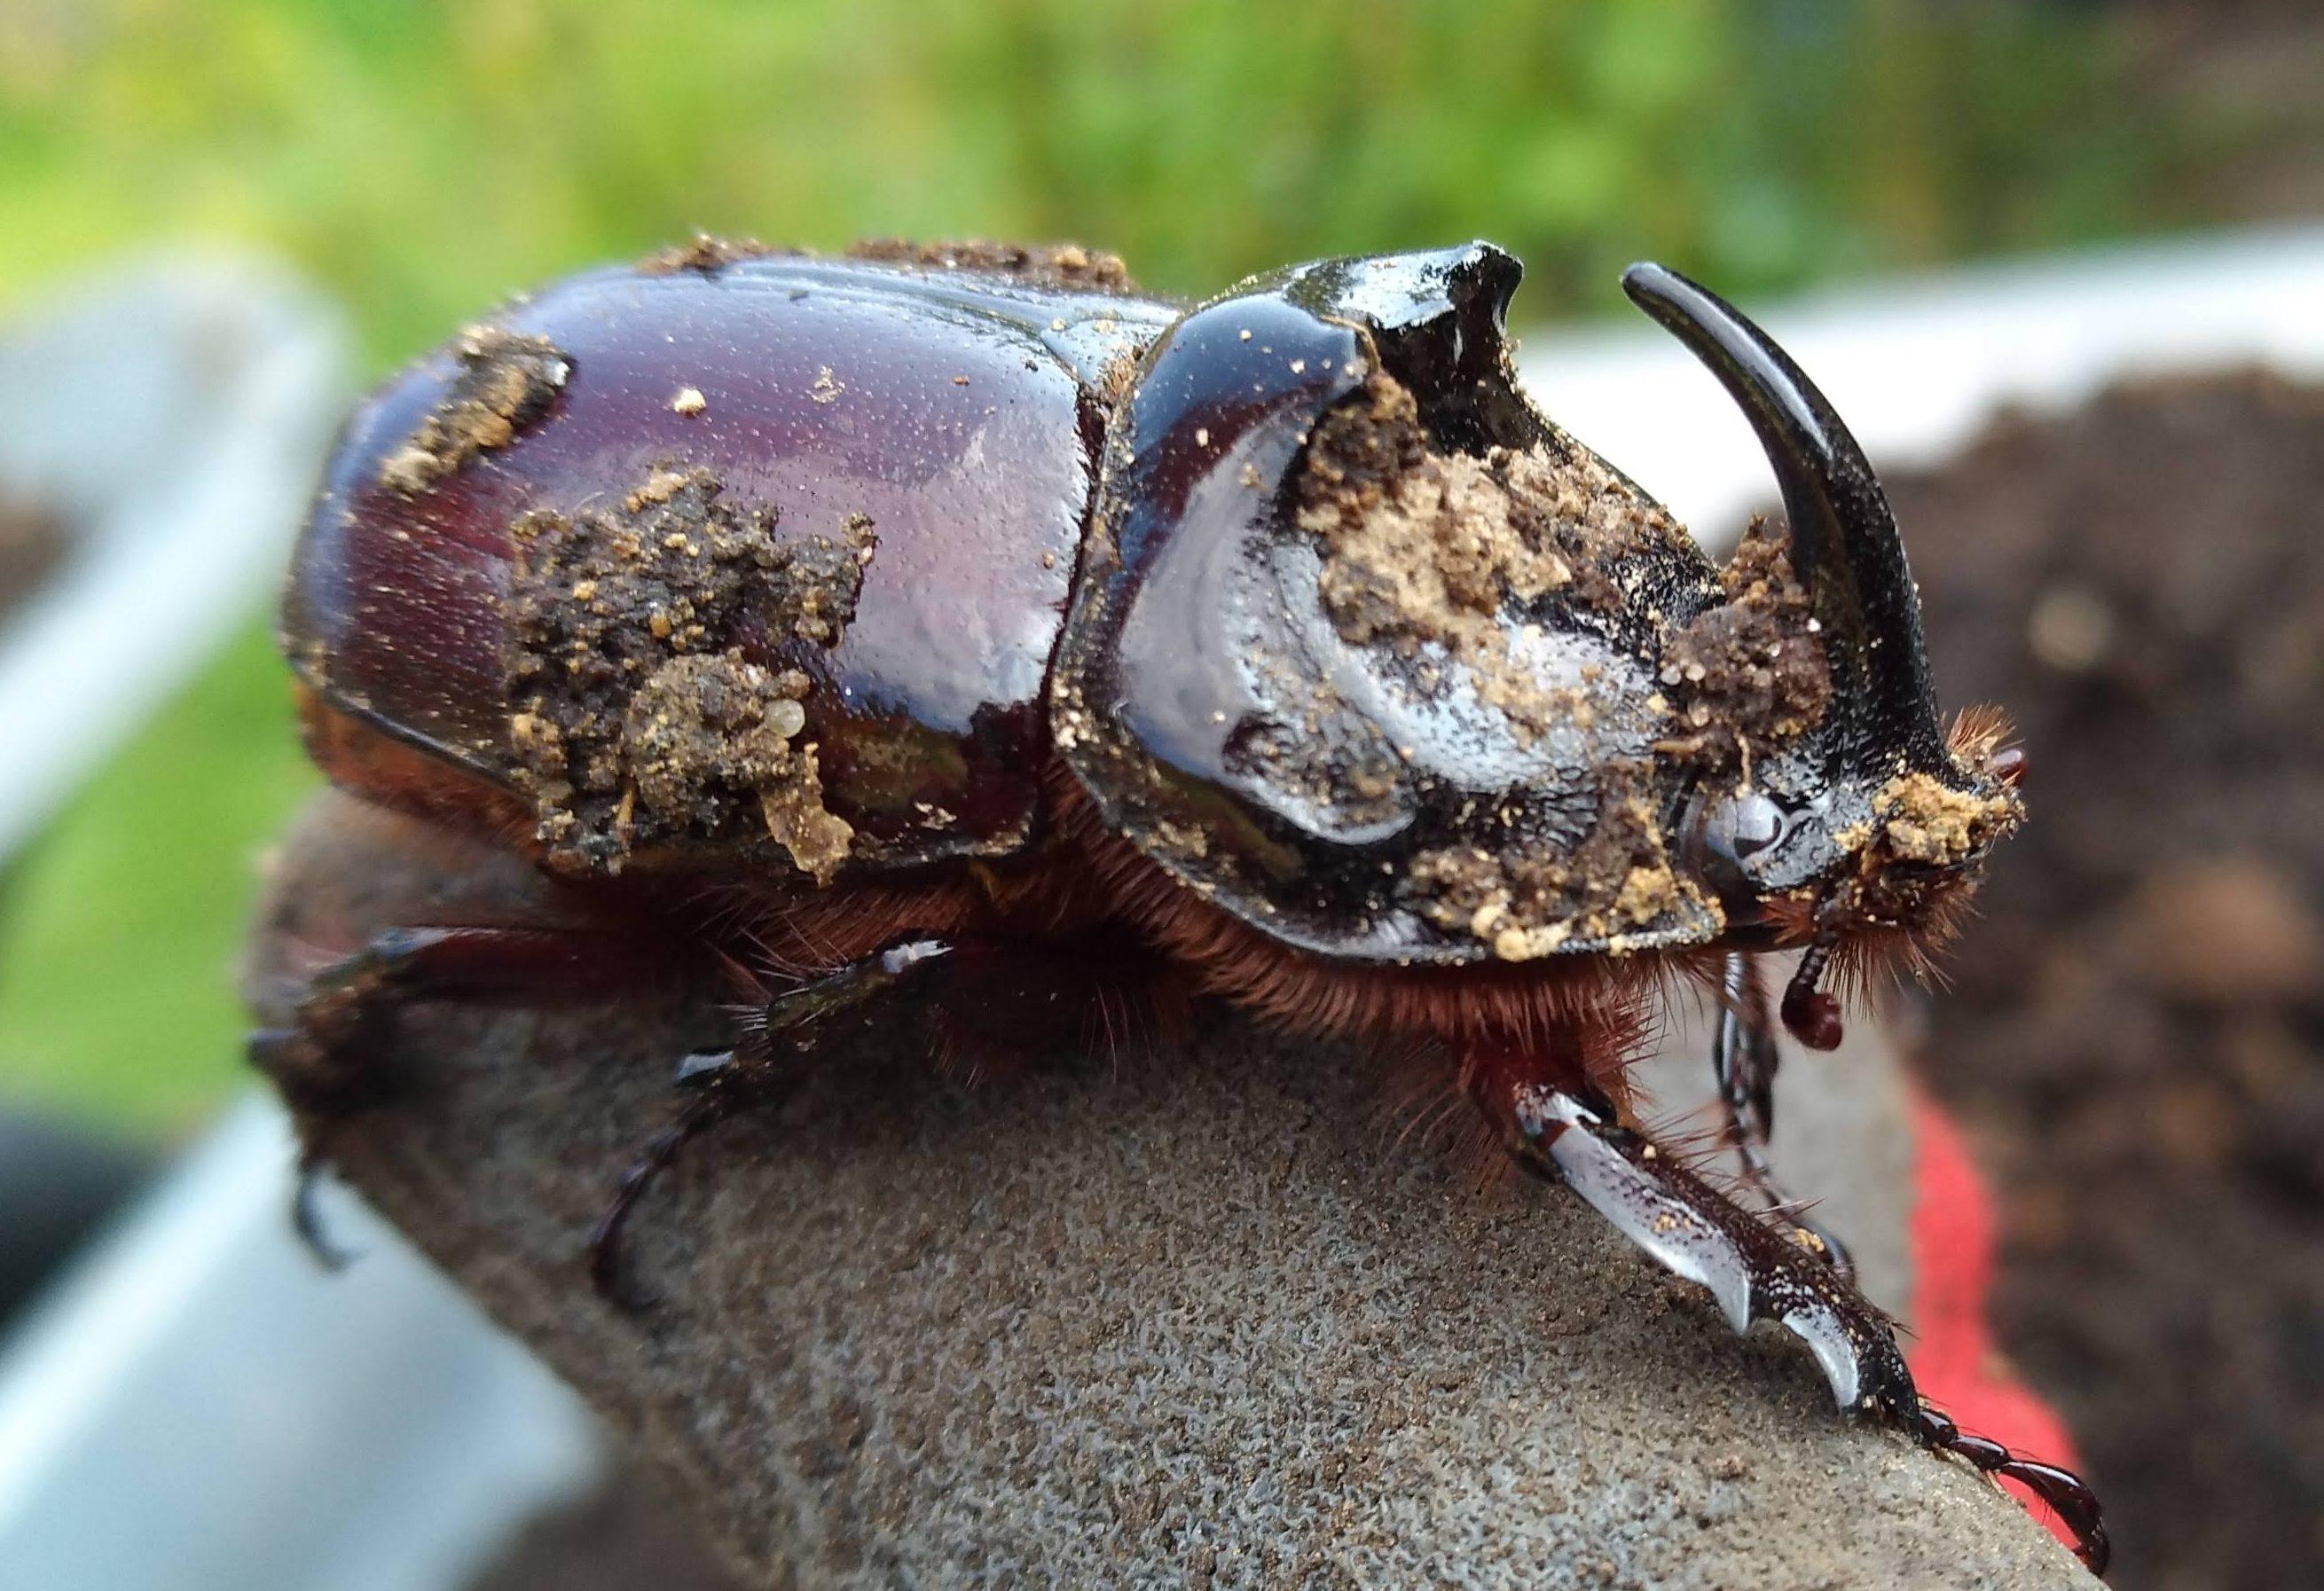 Riesenkäfer im Kompost, Monsterkäfer im Kompost